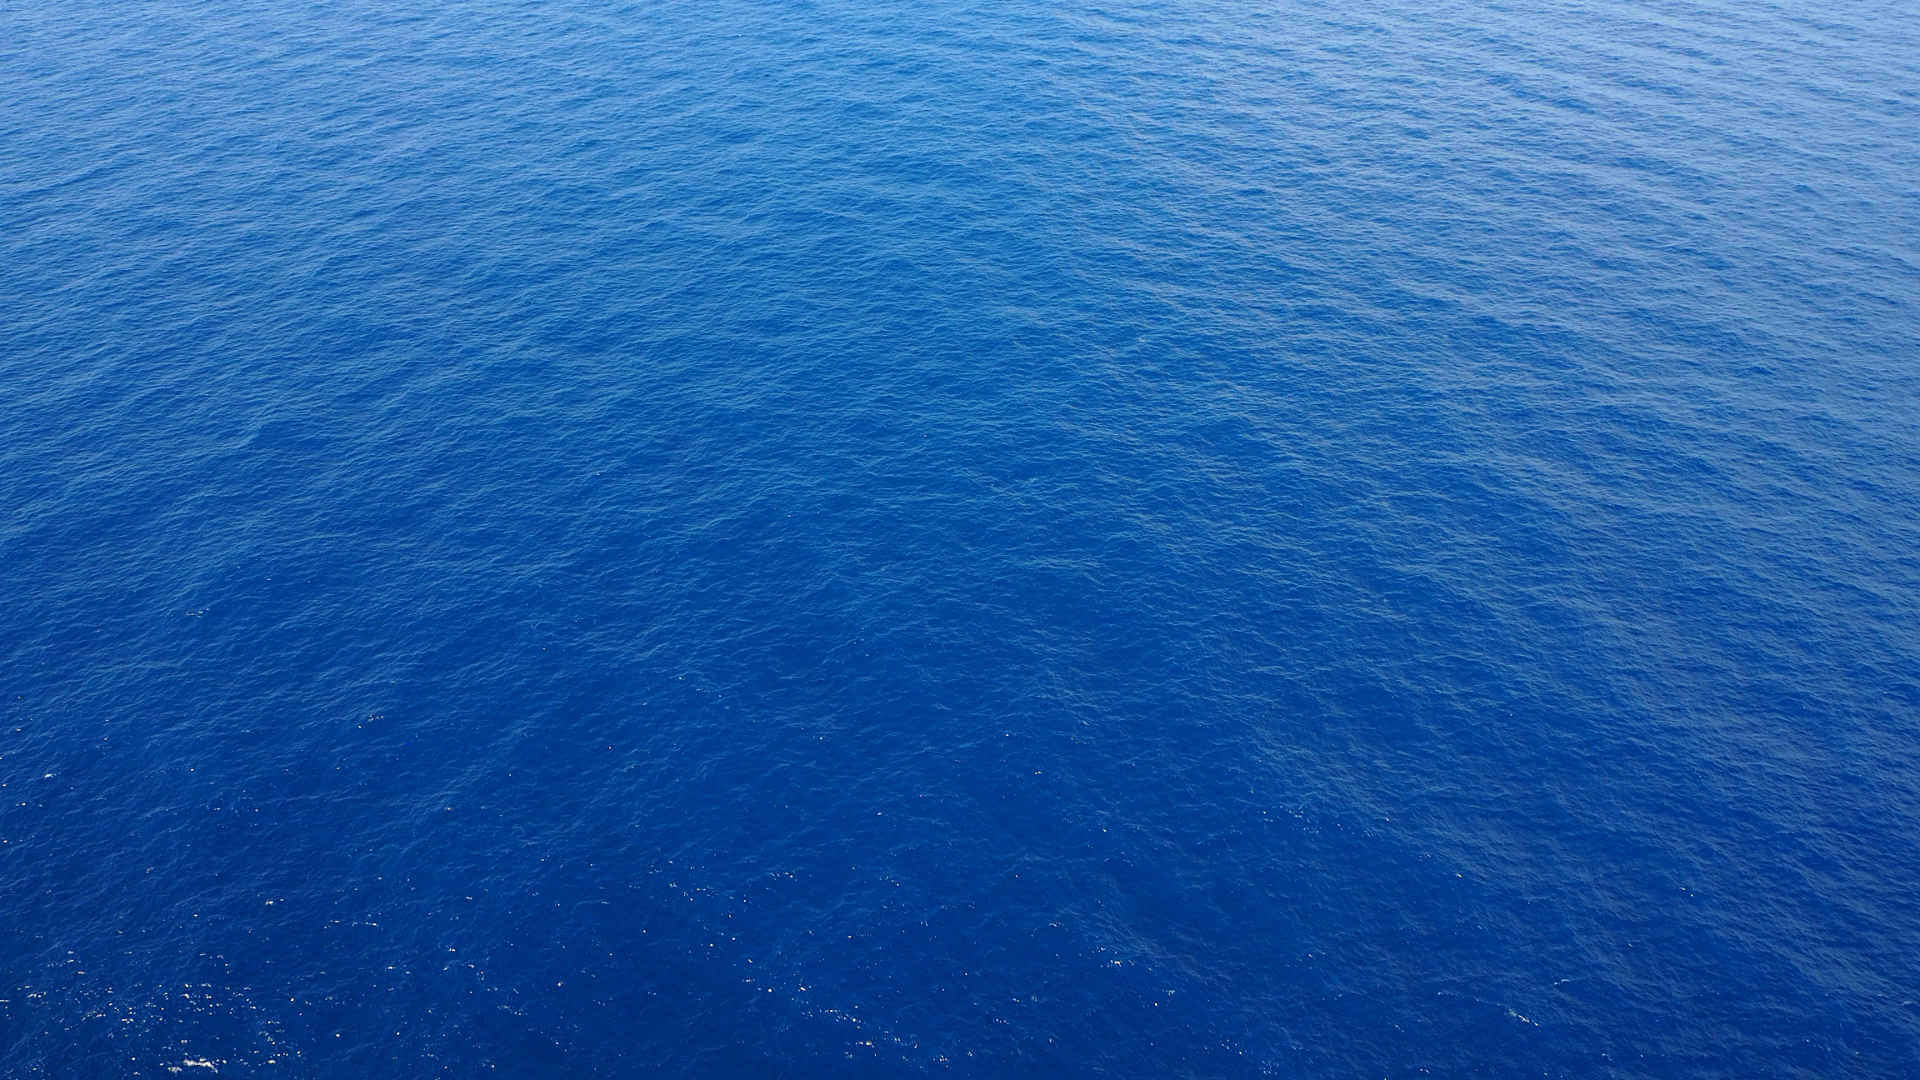 Achtsamkeit - Ruhiges, blaues Meer